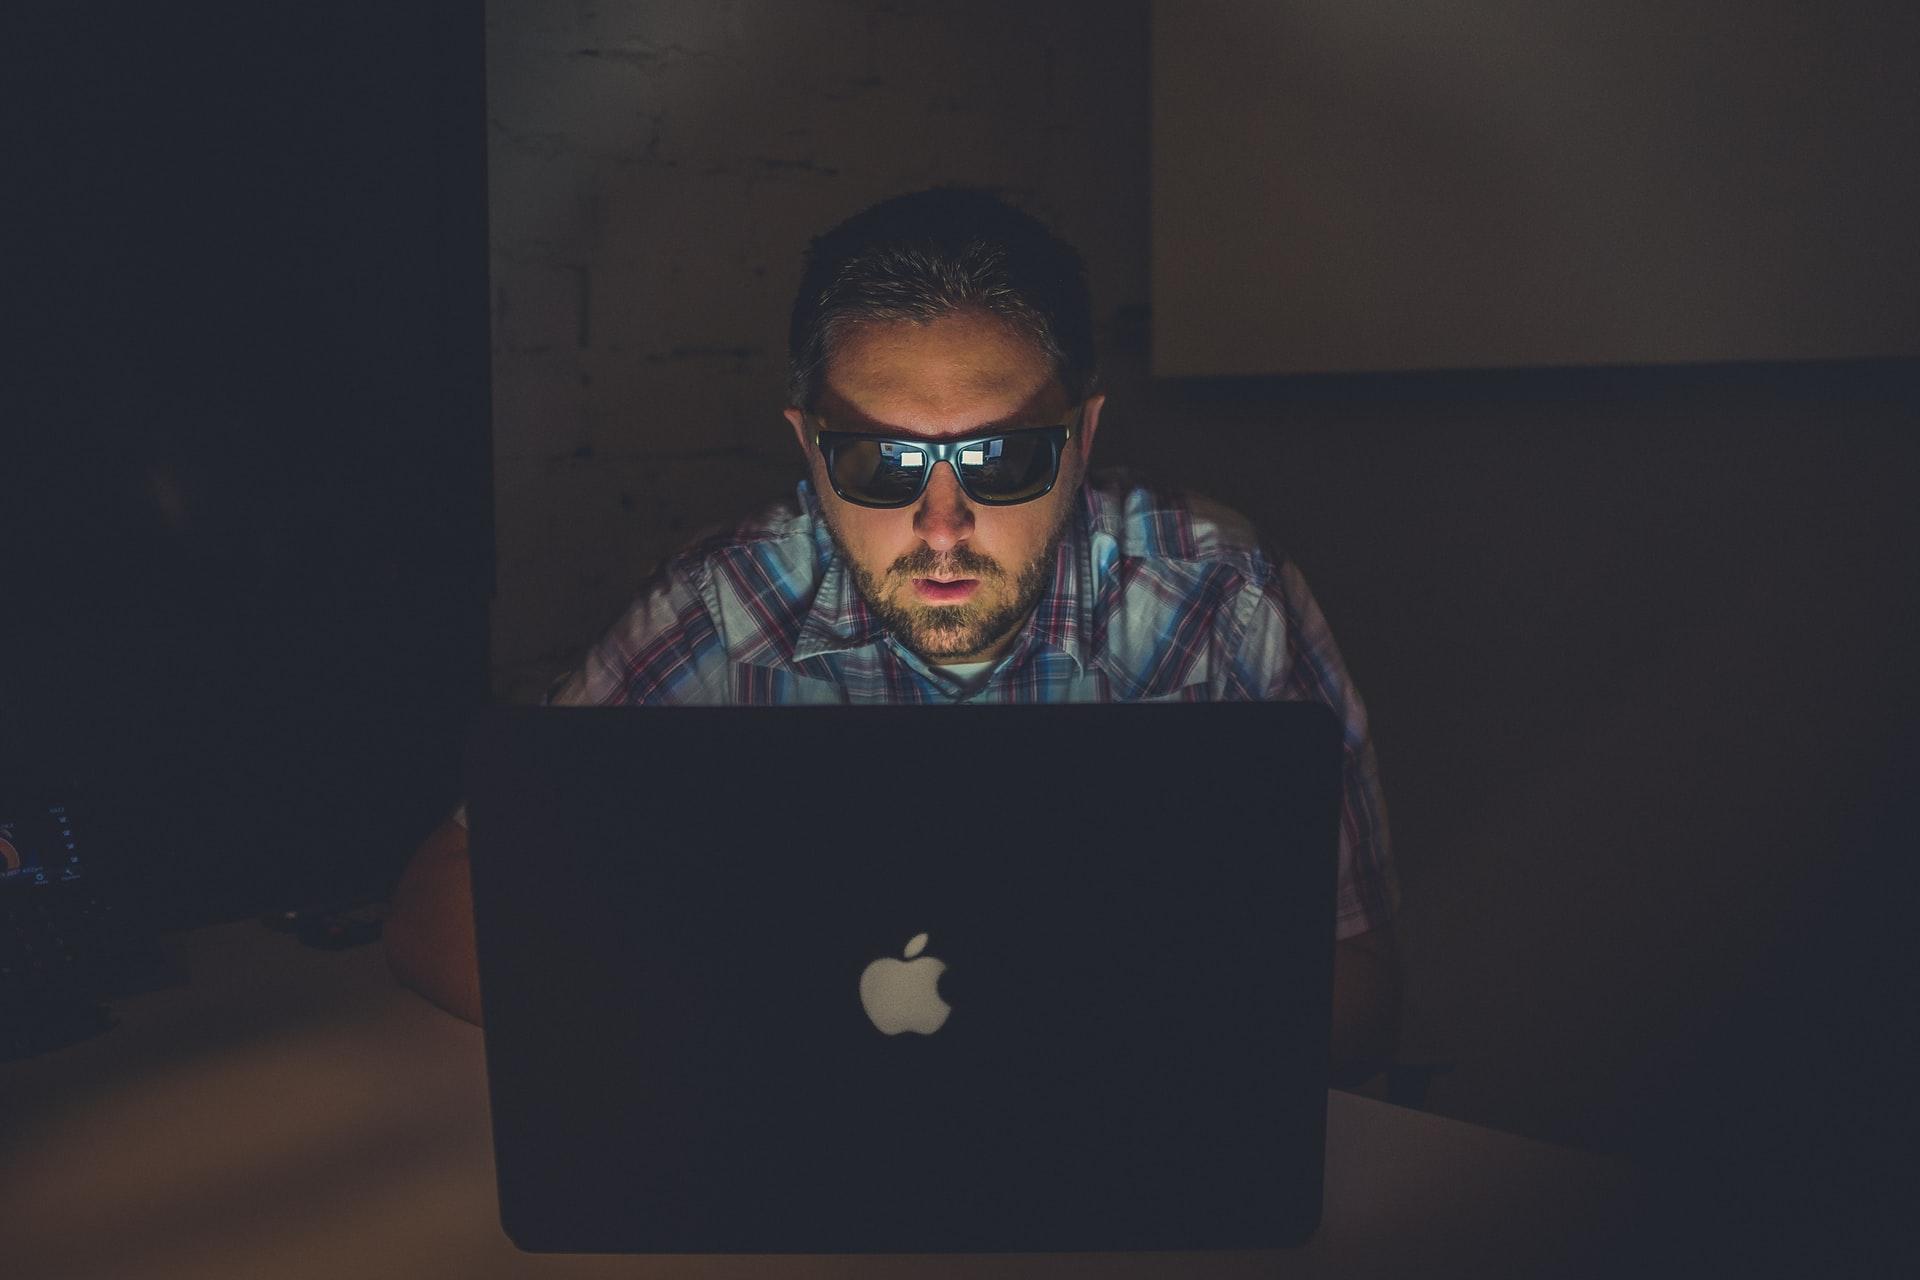 Hacker hacking an investor website